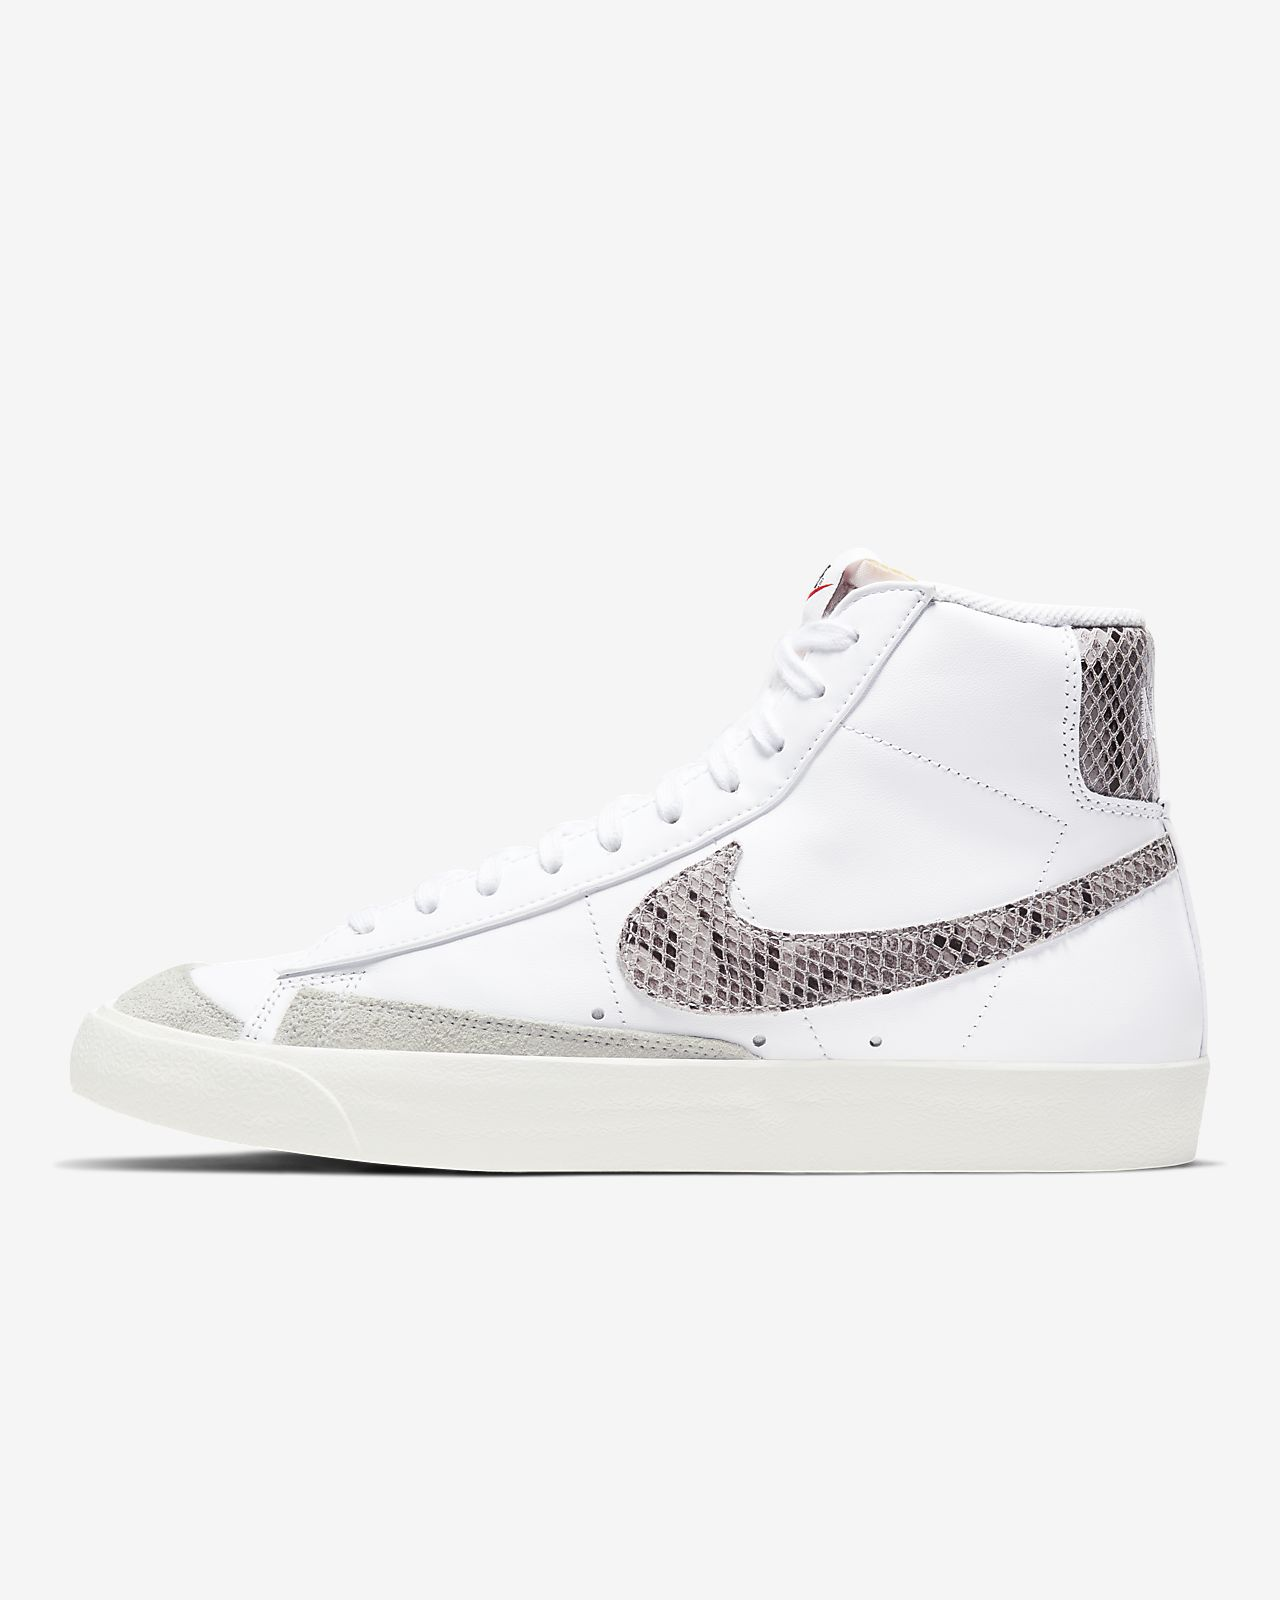 Nike Blazer Mid 77 Vintage Schuh